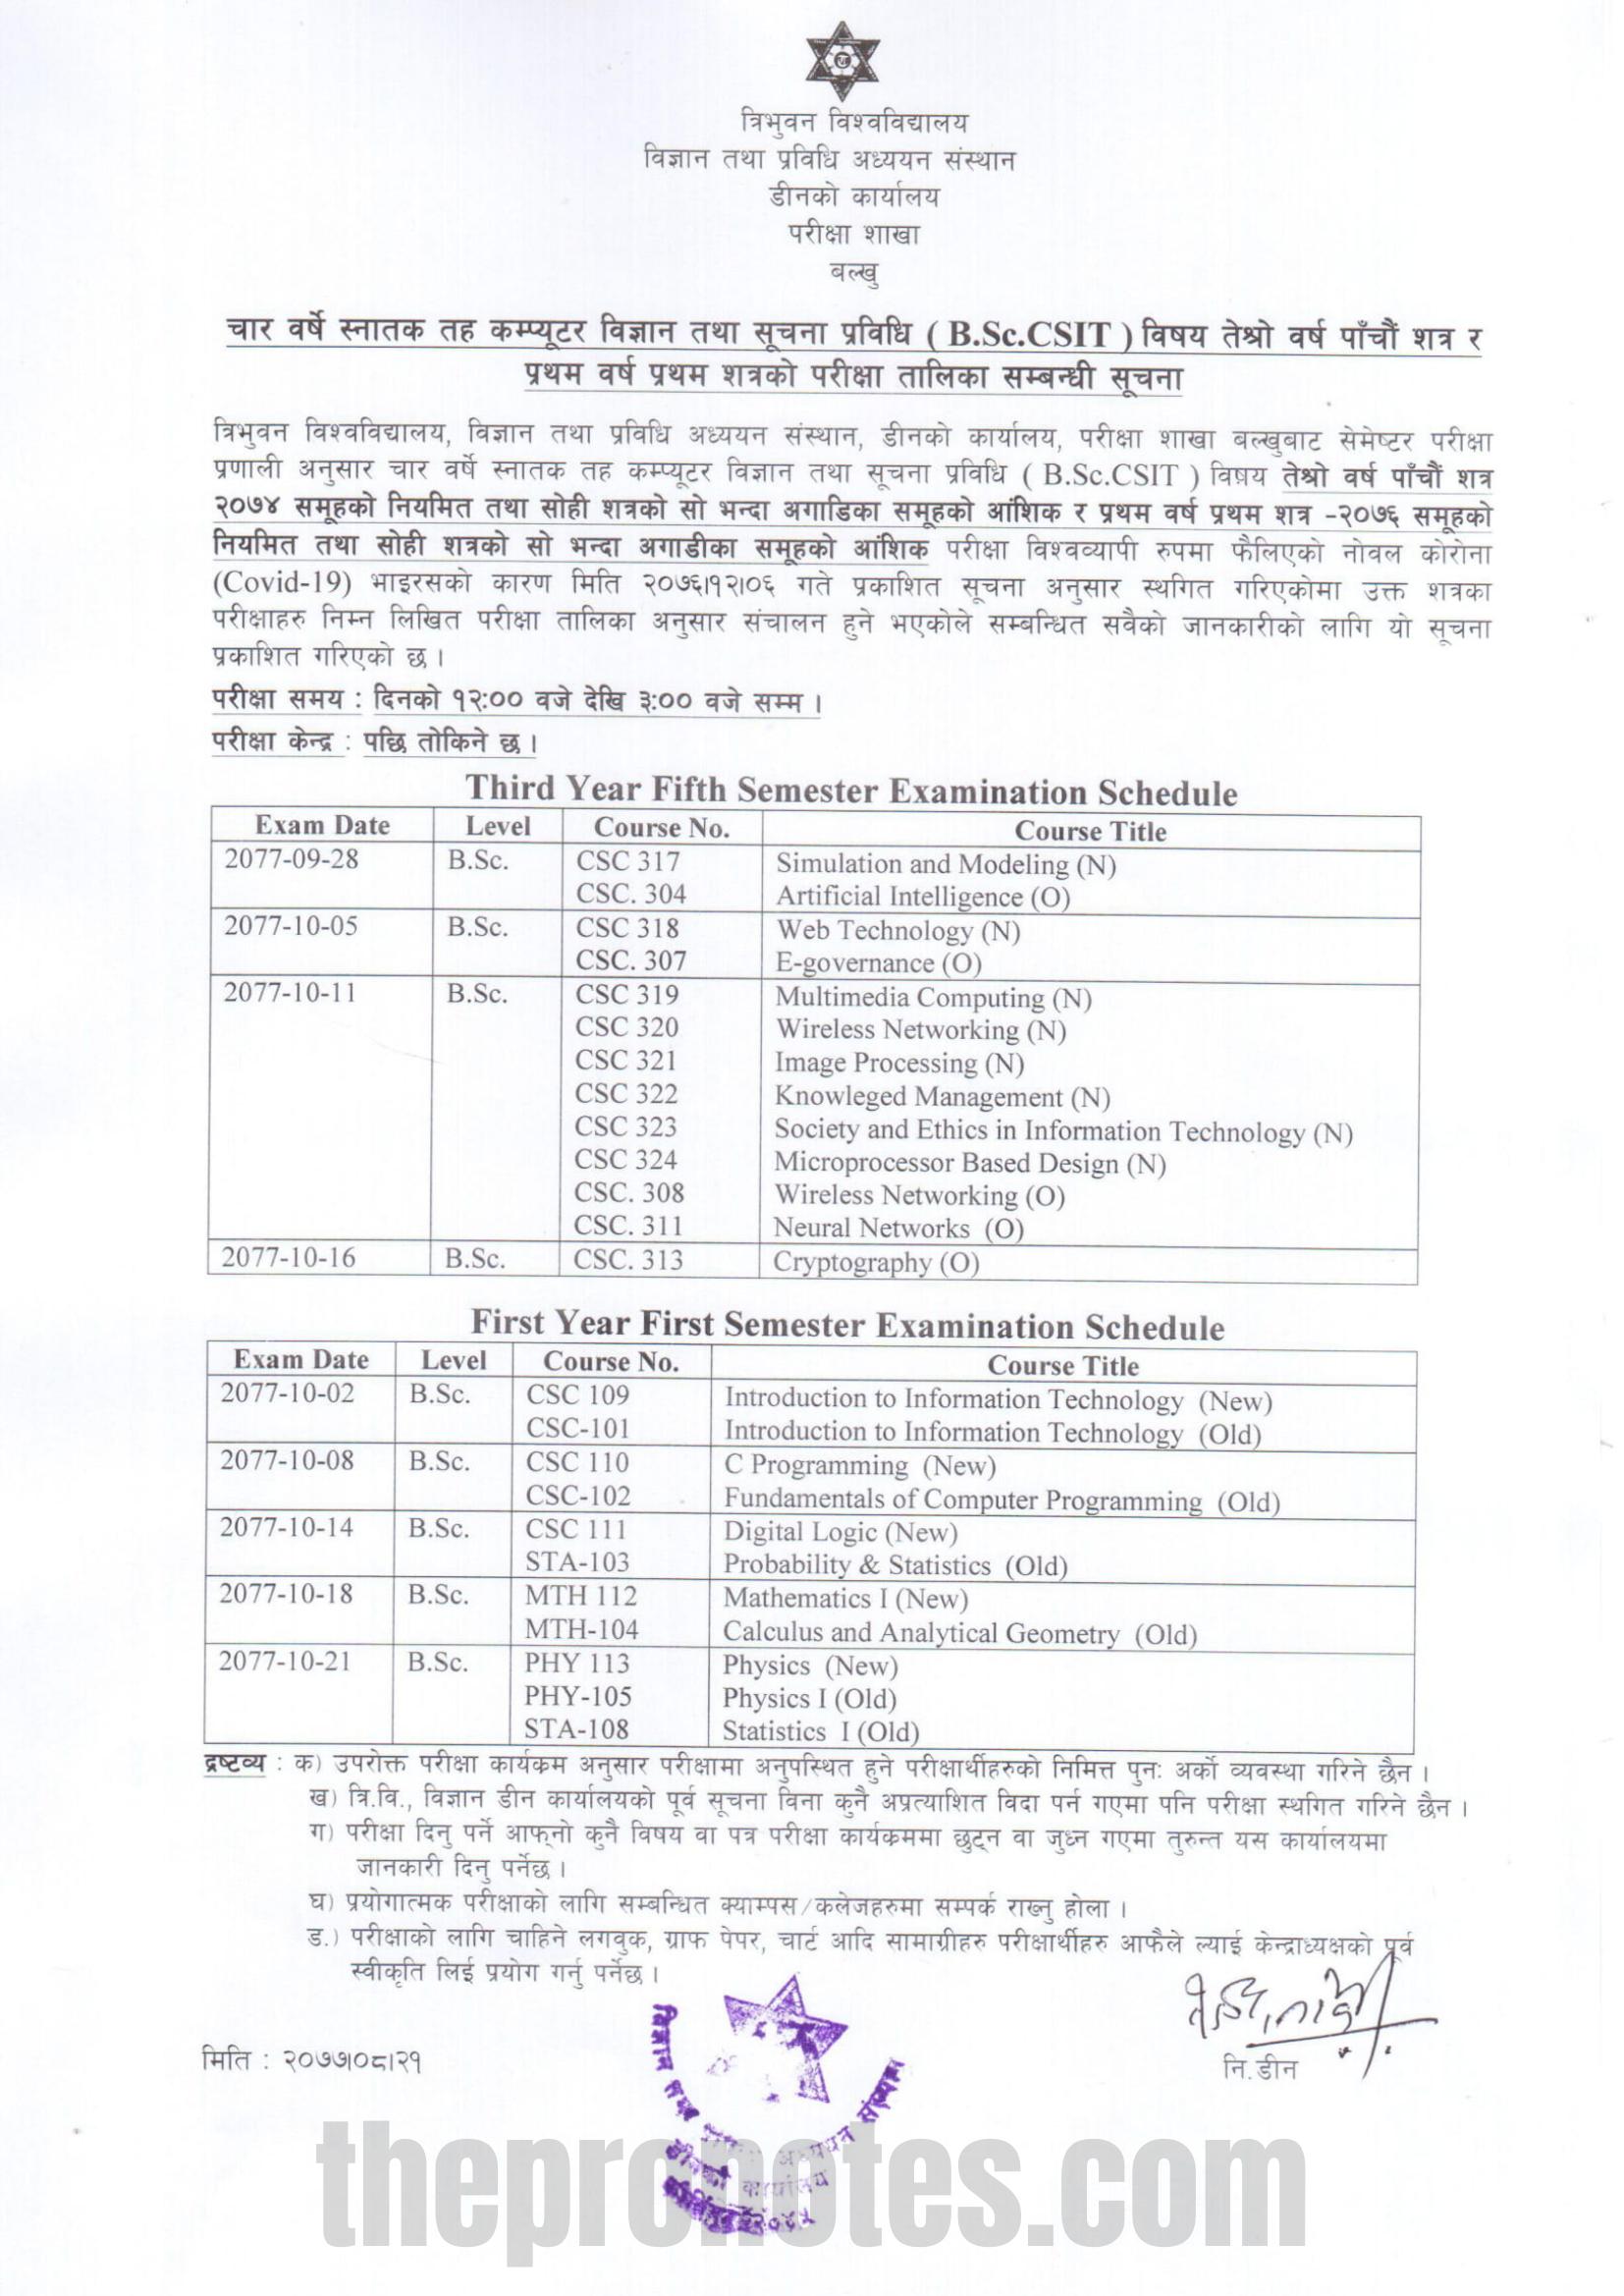 B.Sc. CSIT fifth semester examination routine 2077